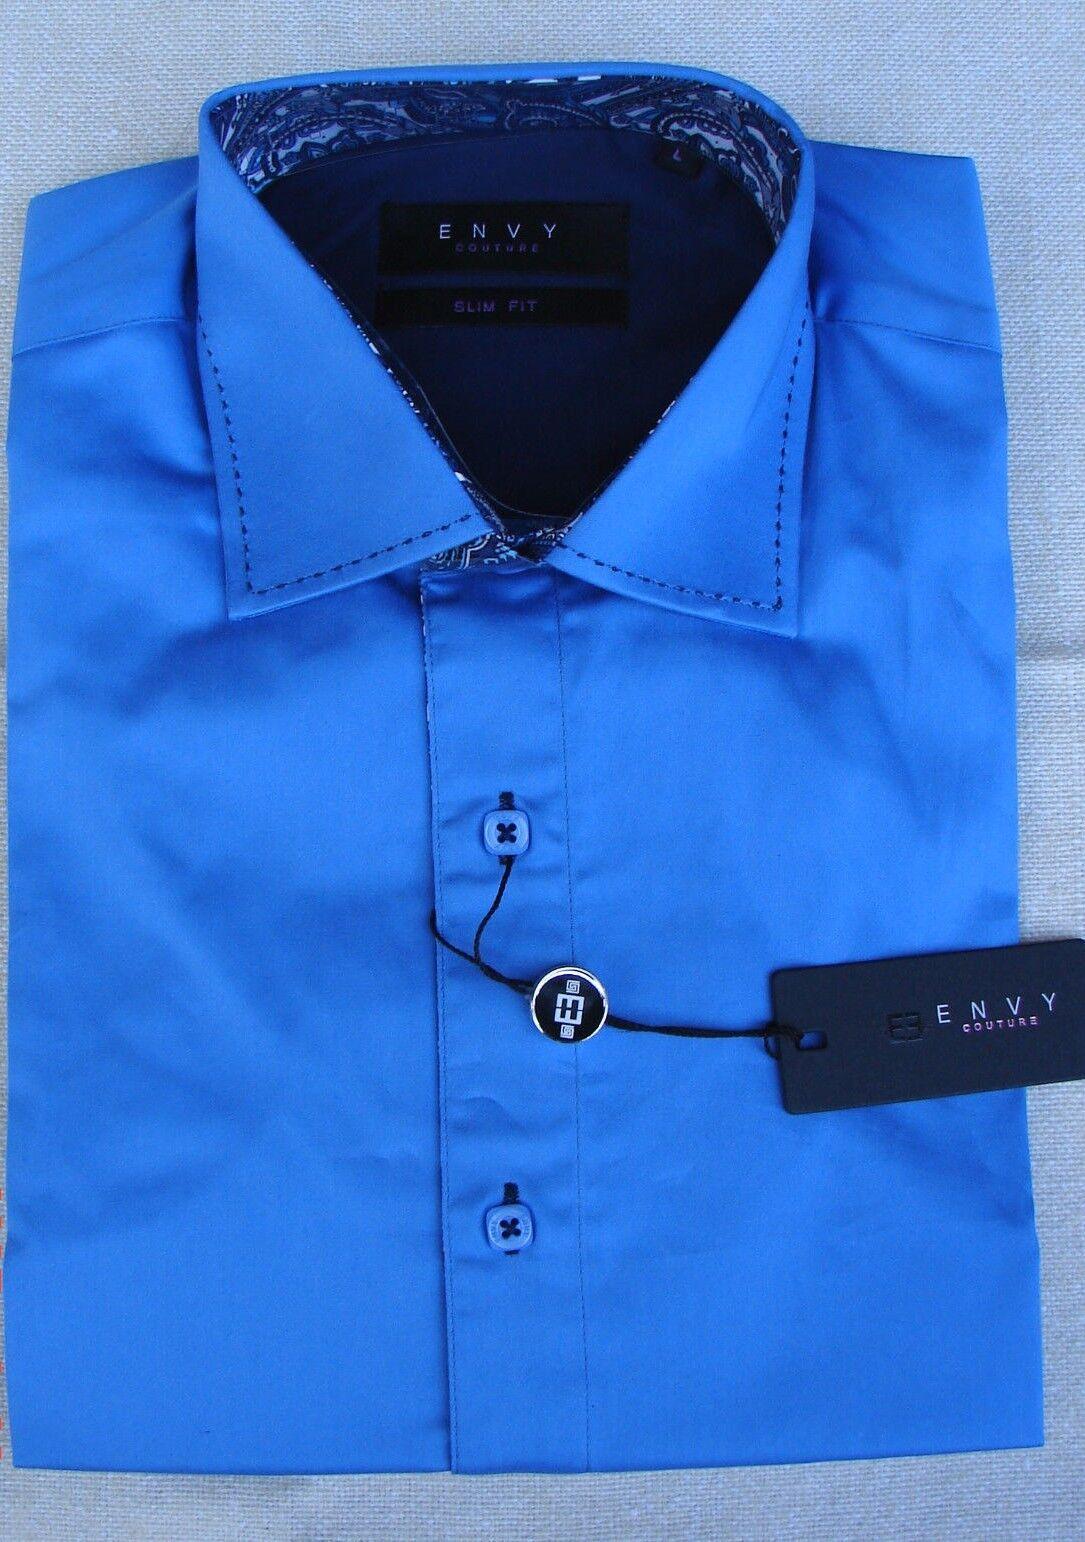 ENVY REVOLUTION Long Sleeve Slim Fit Men's Shirt size L.